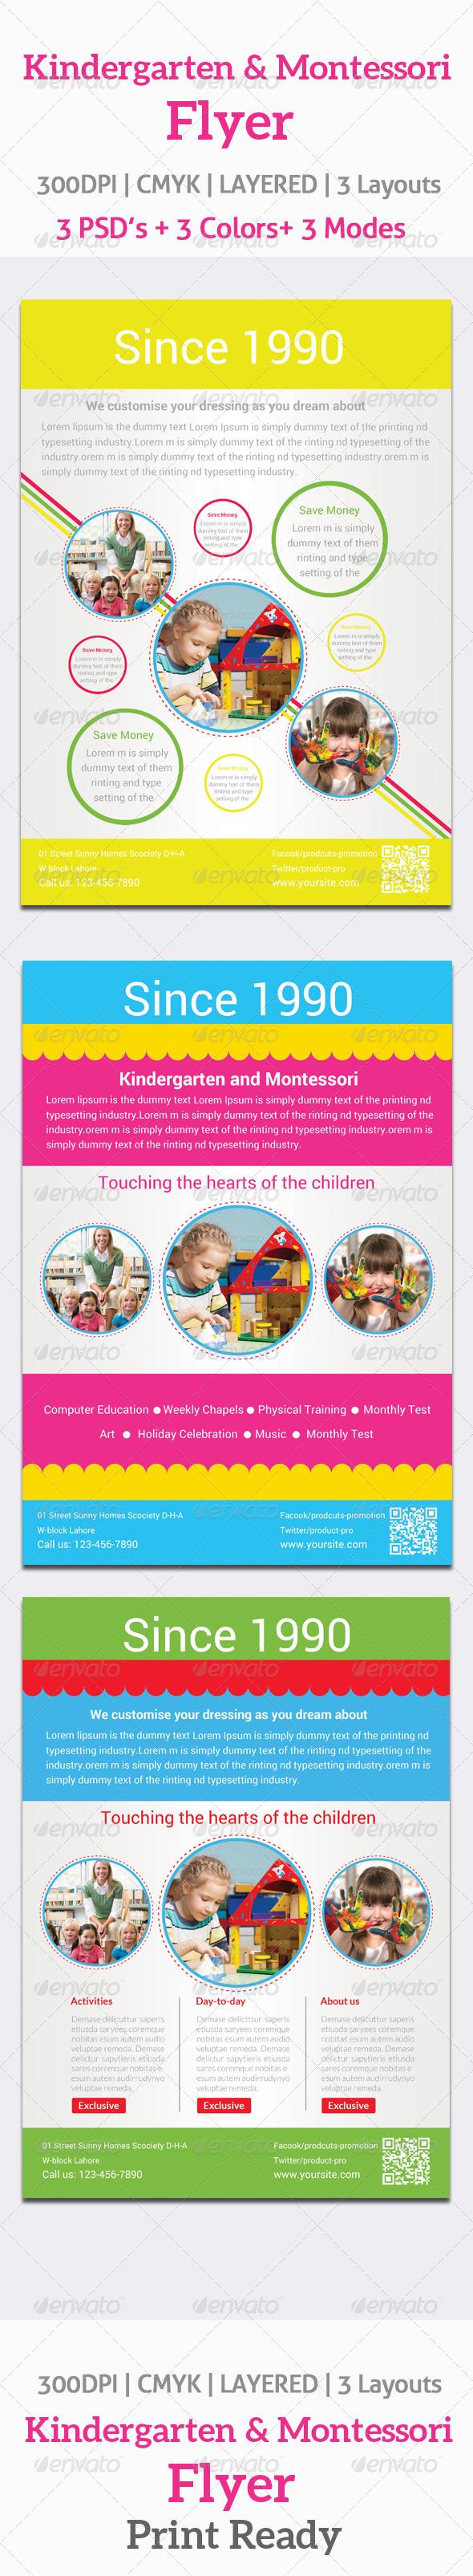 Kindergarten and Montessori Flyer Template #GraphicRiver   Print ...